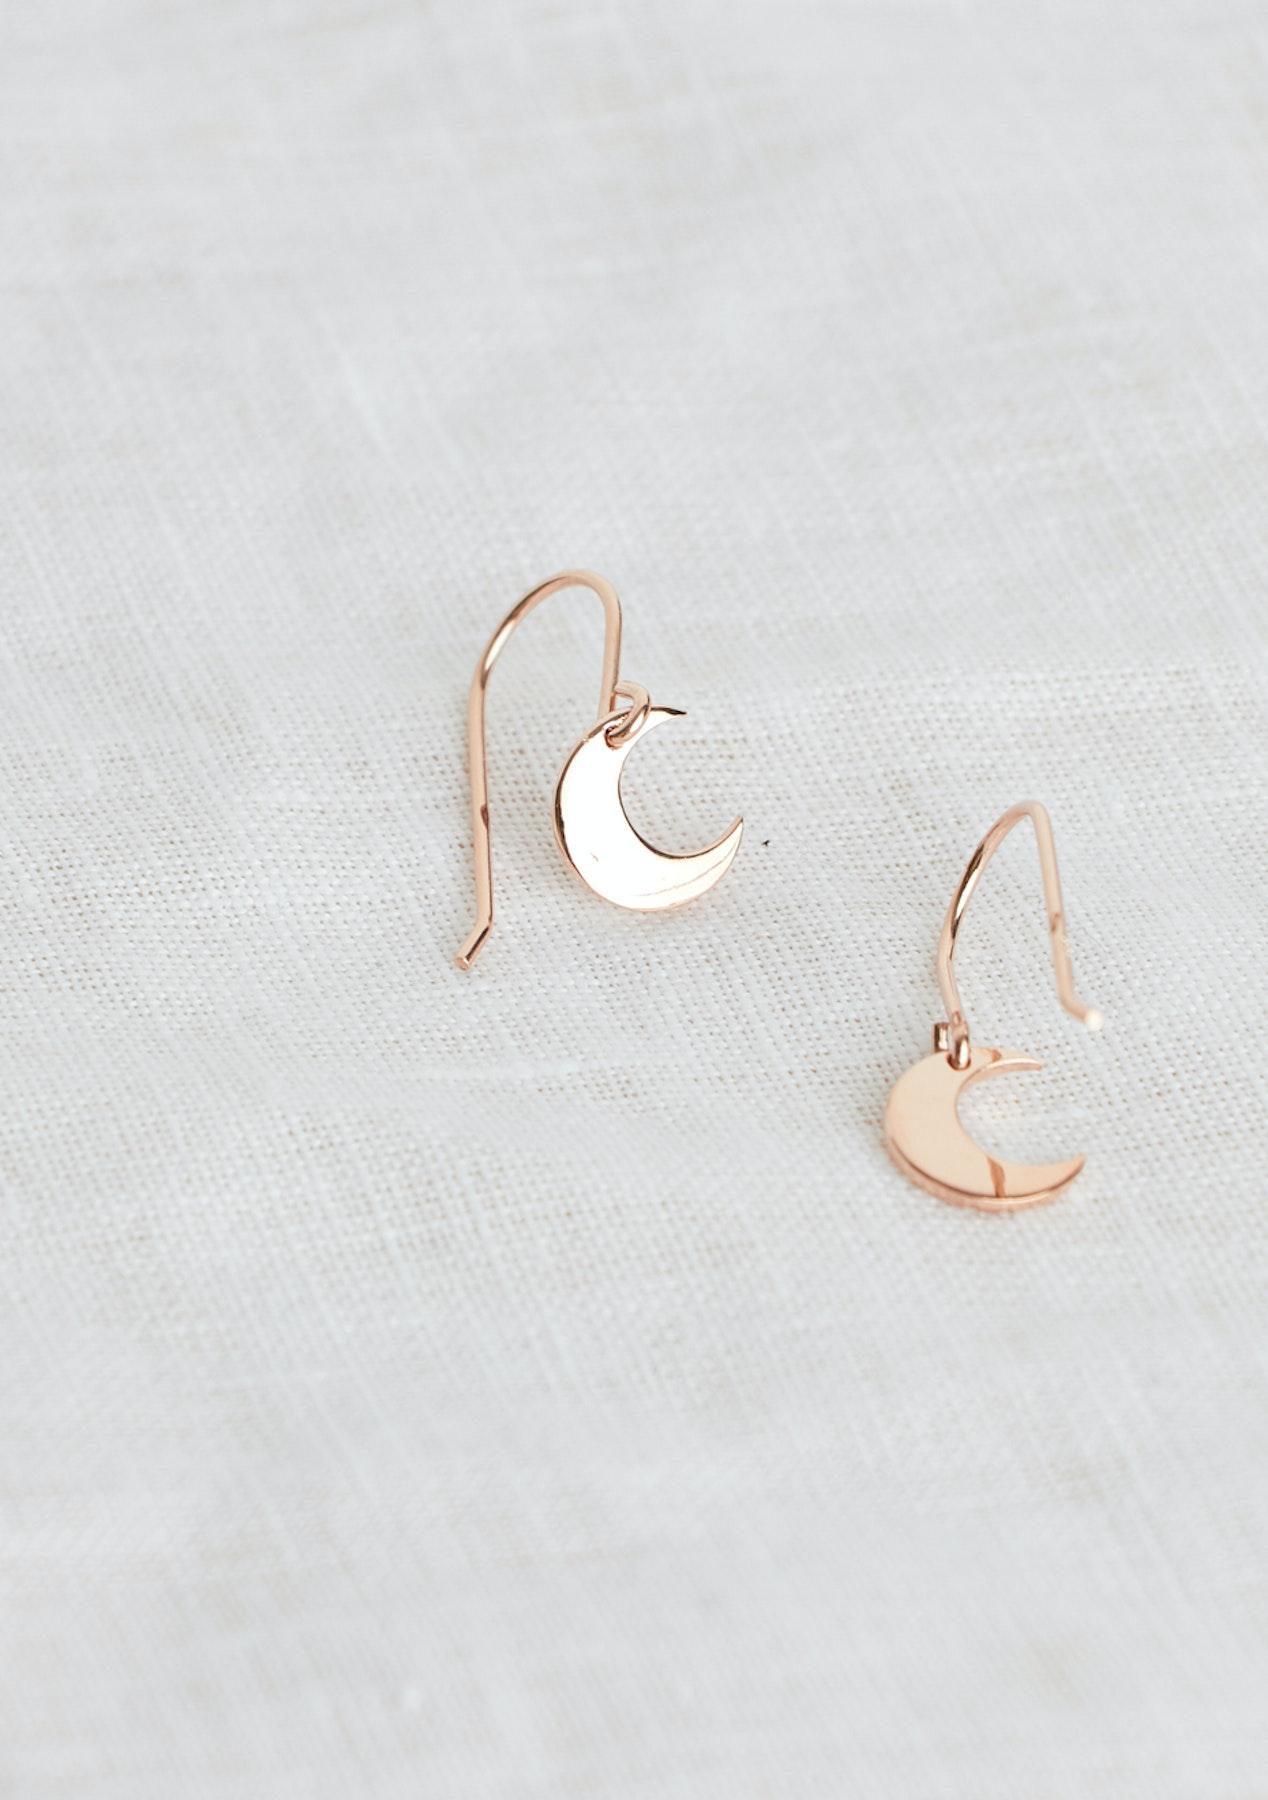 8e5339c3 Adornment - Moon Dangle Earrings - Rose Gold